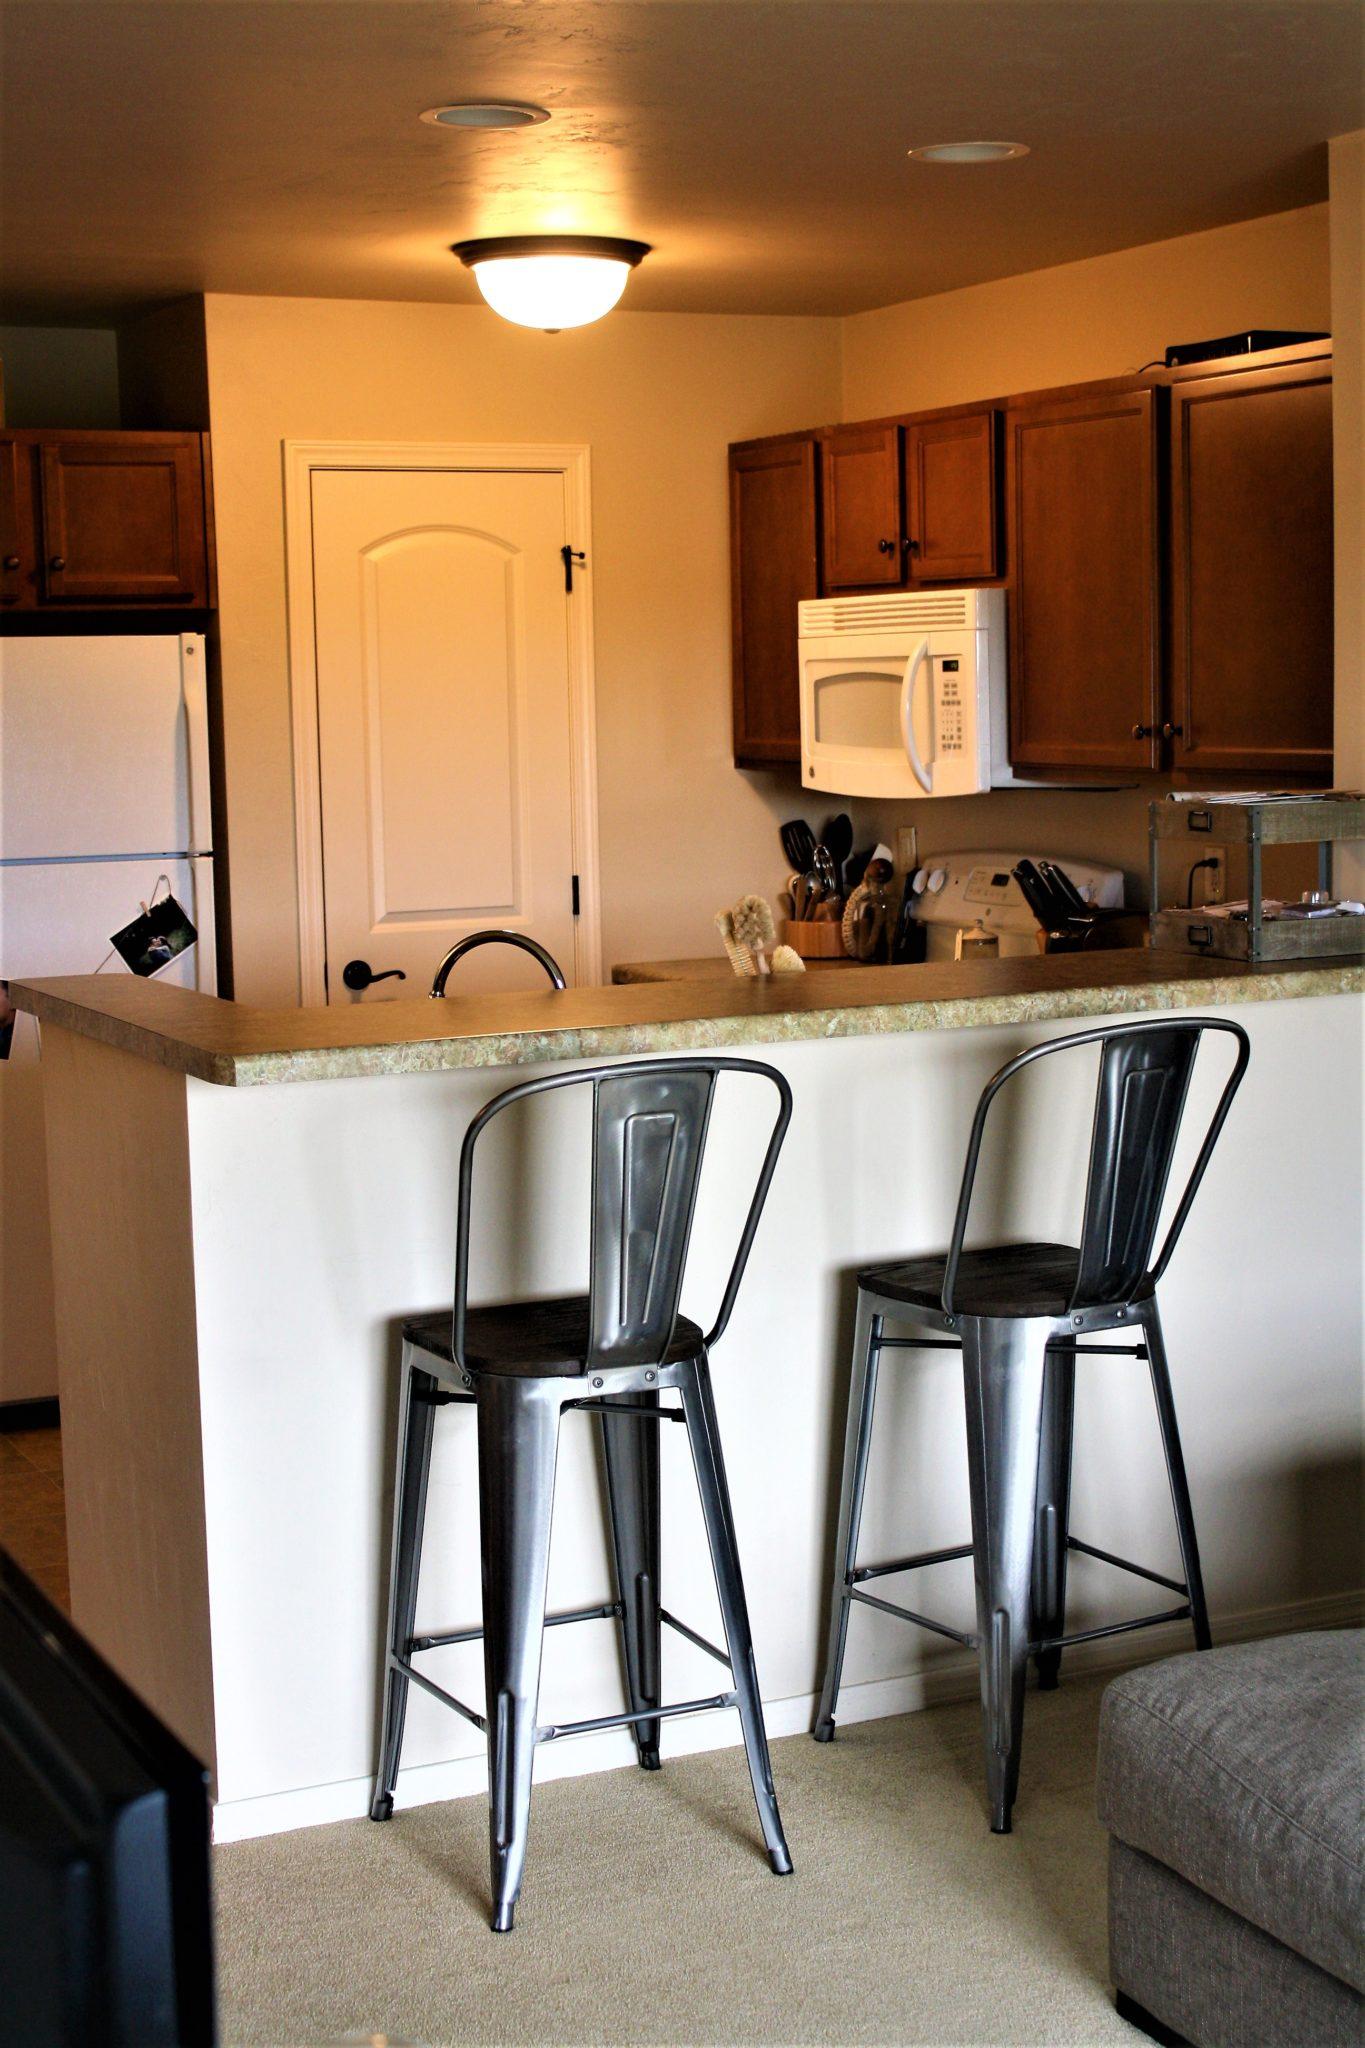 1 bedroom Loft - Breakfast Bar - Perfect for entertaining!